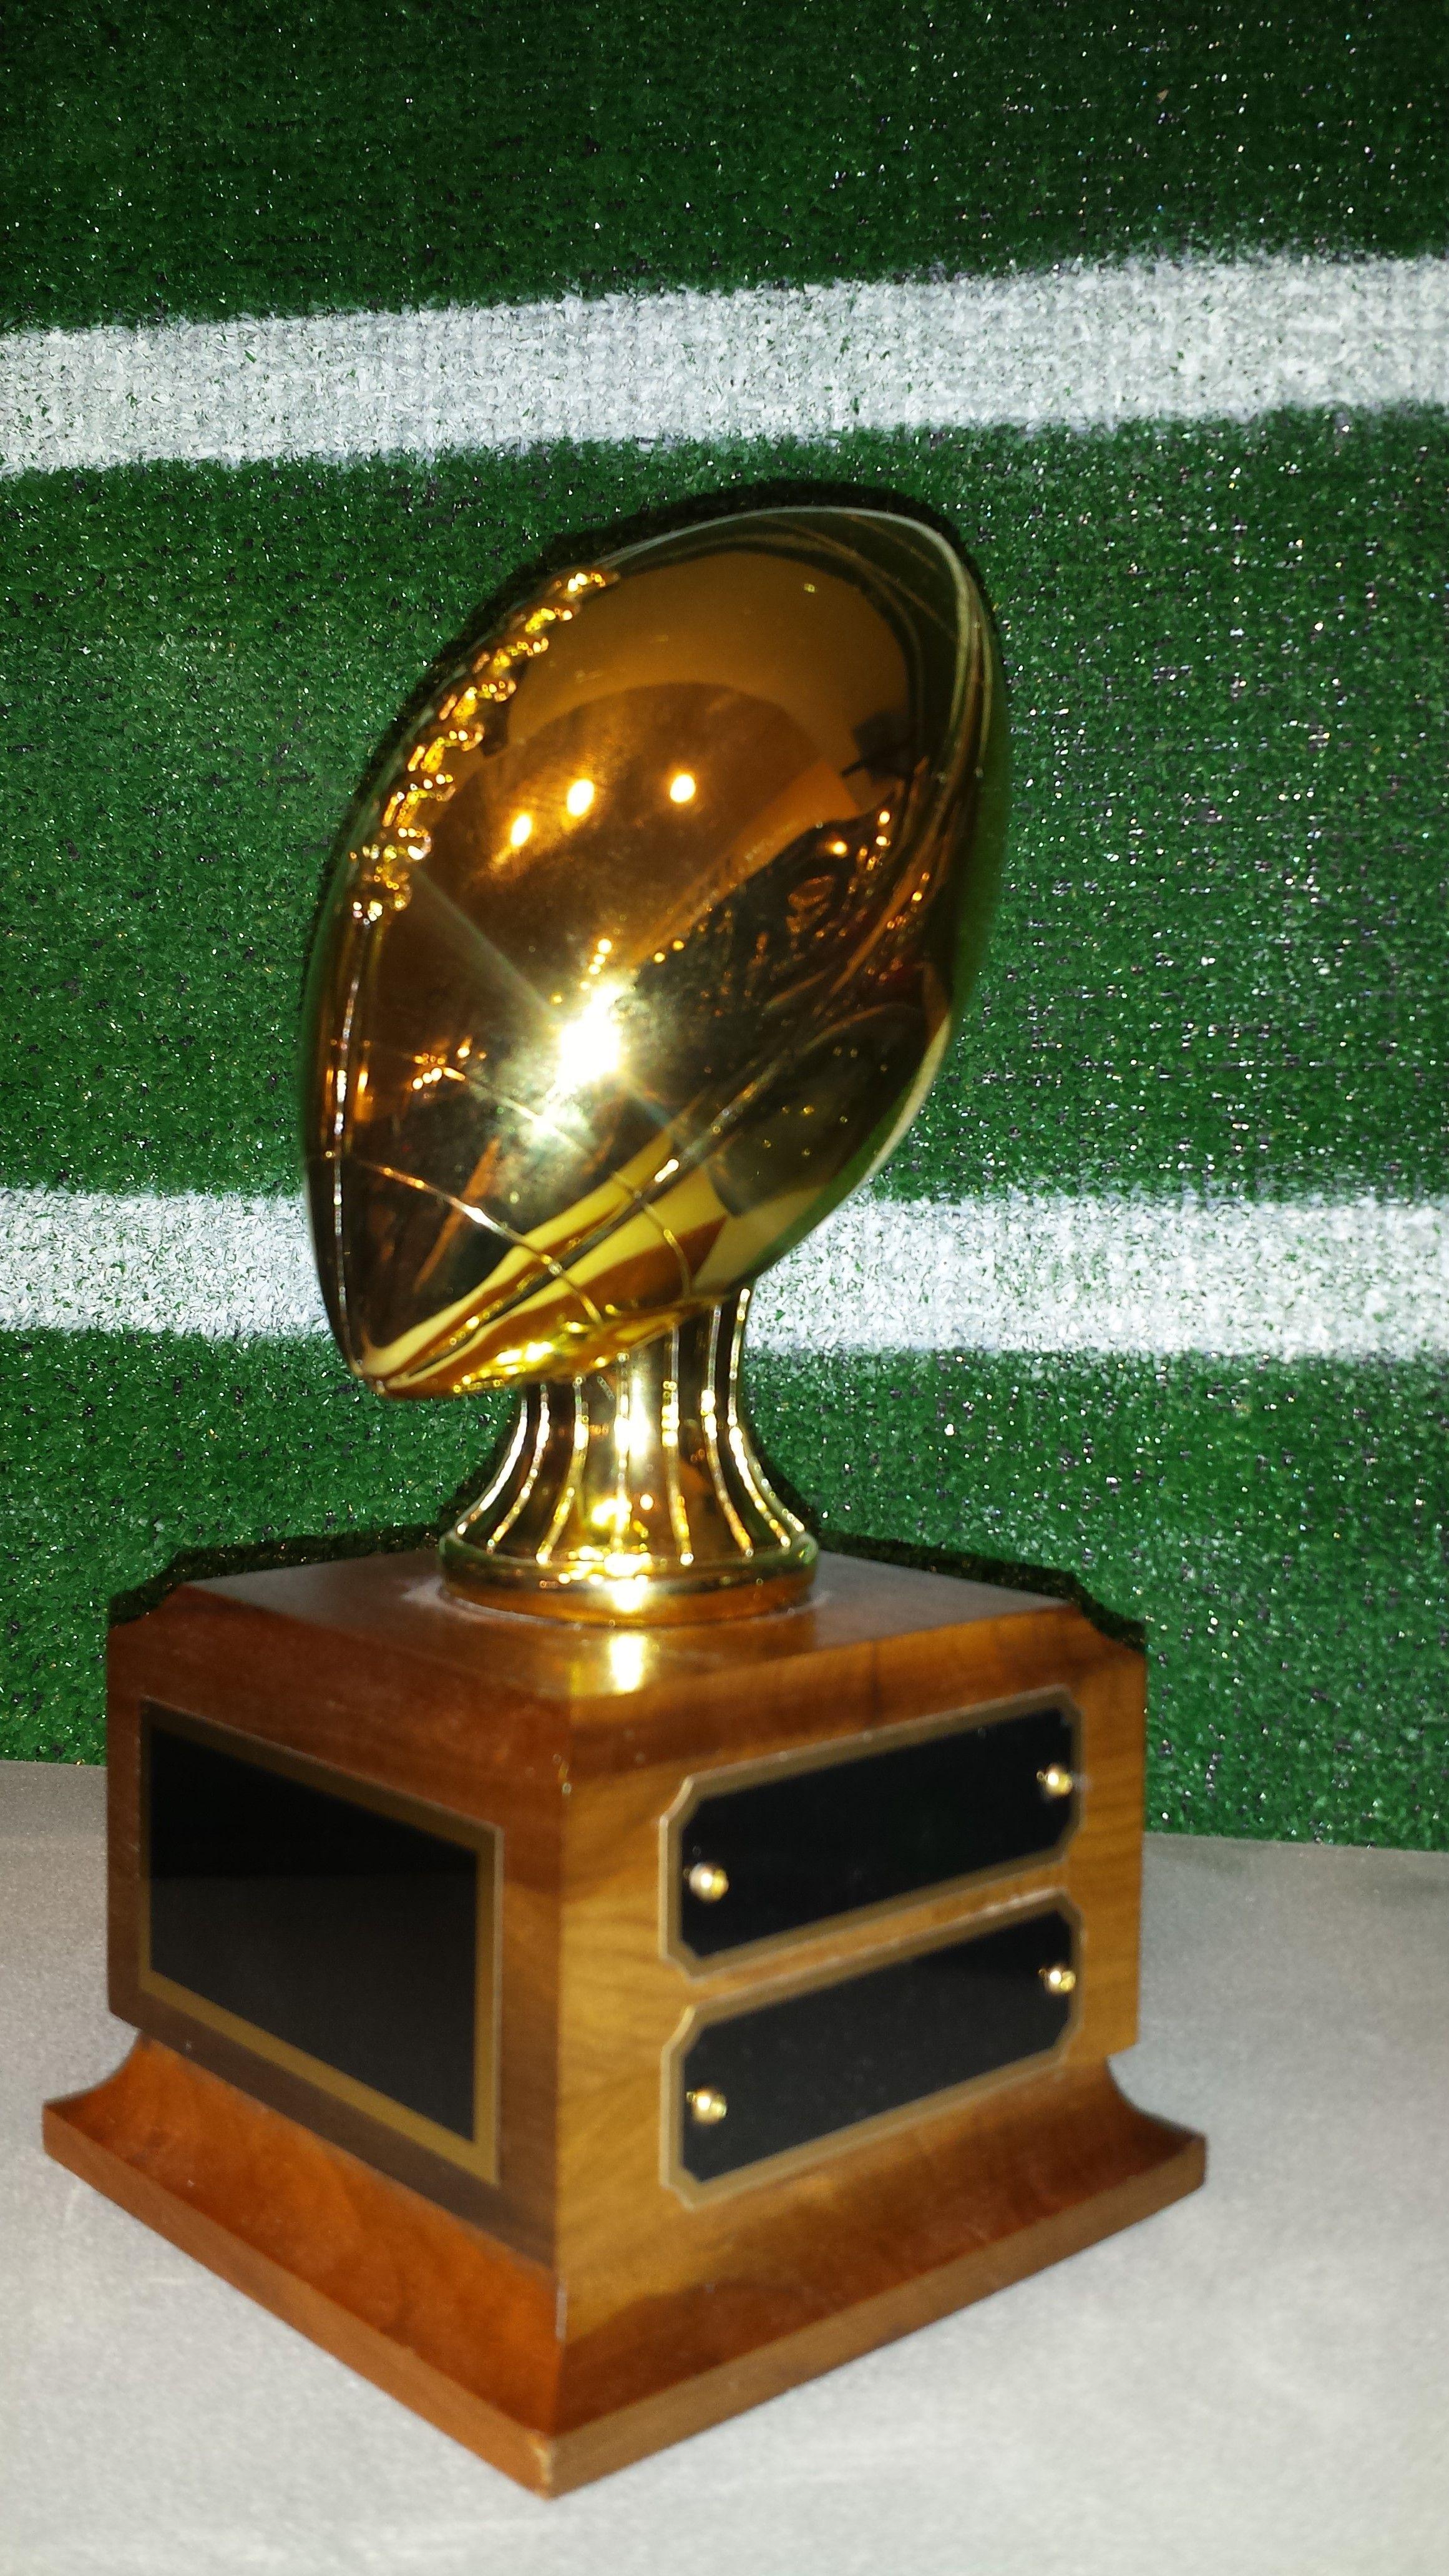 A small fantasy football trophy. www.rcbawards.com